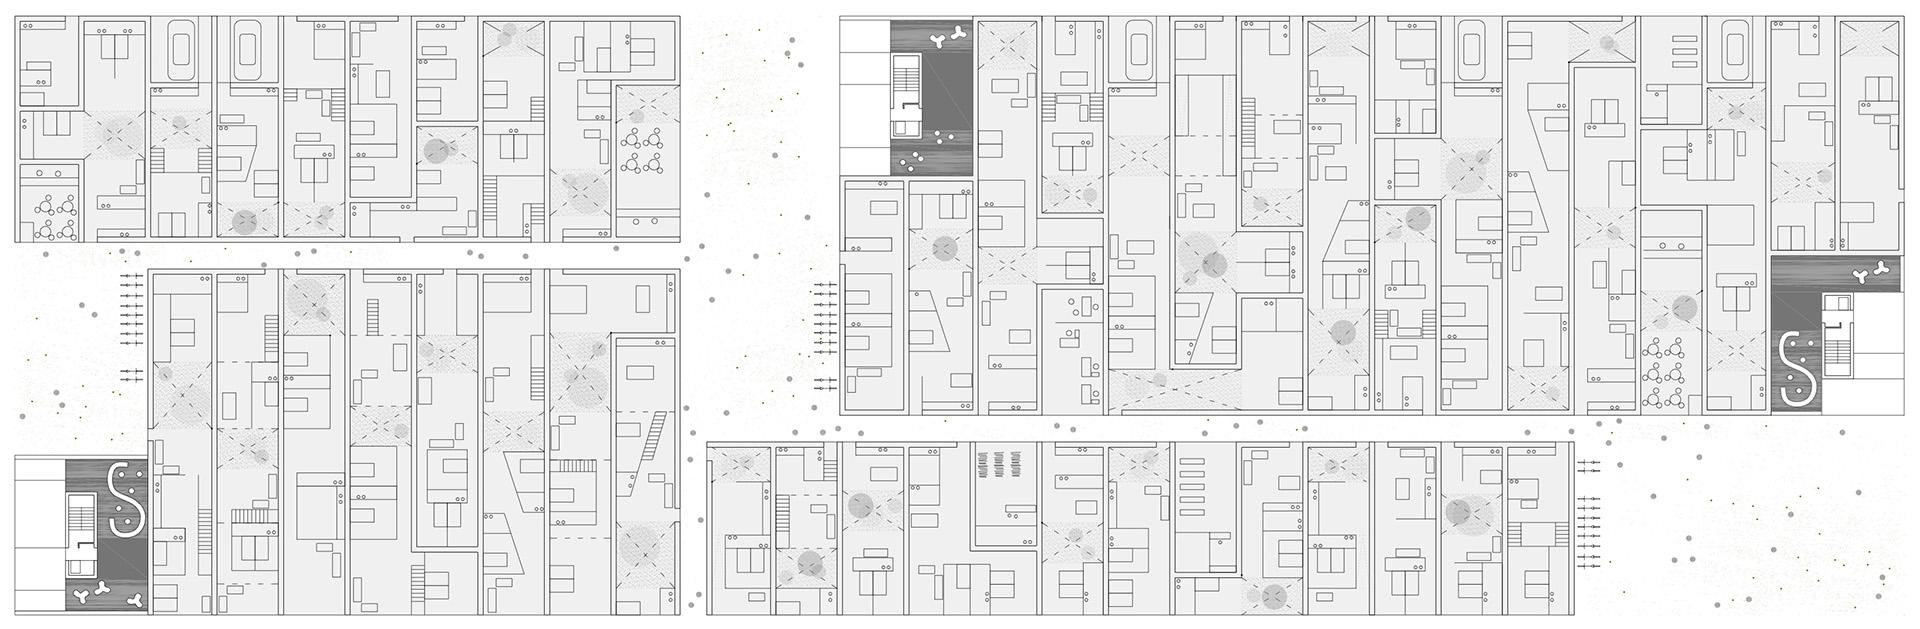 01_plan_PLAYstudio-stavanger-lervig-housing